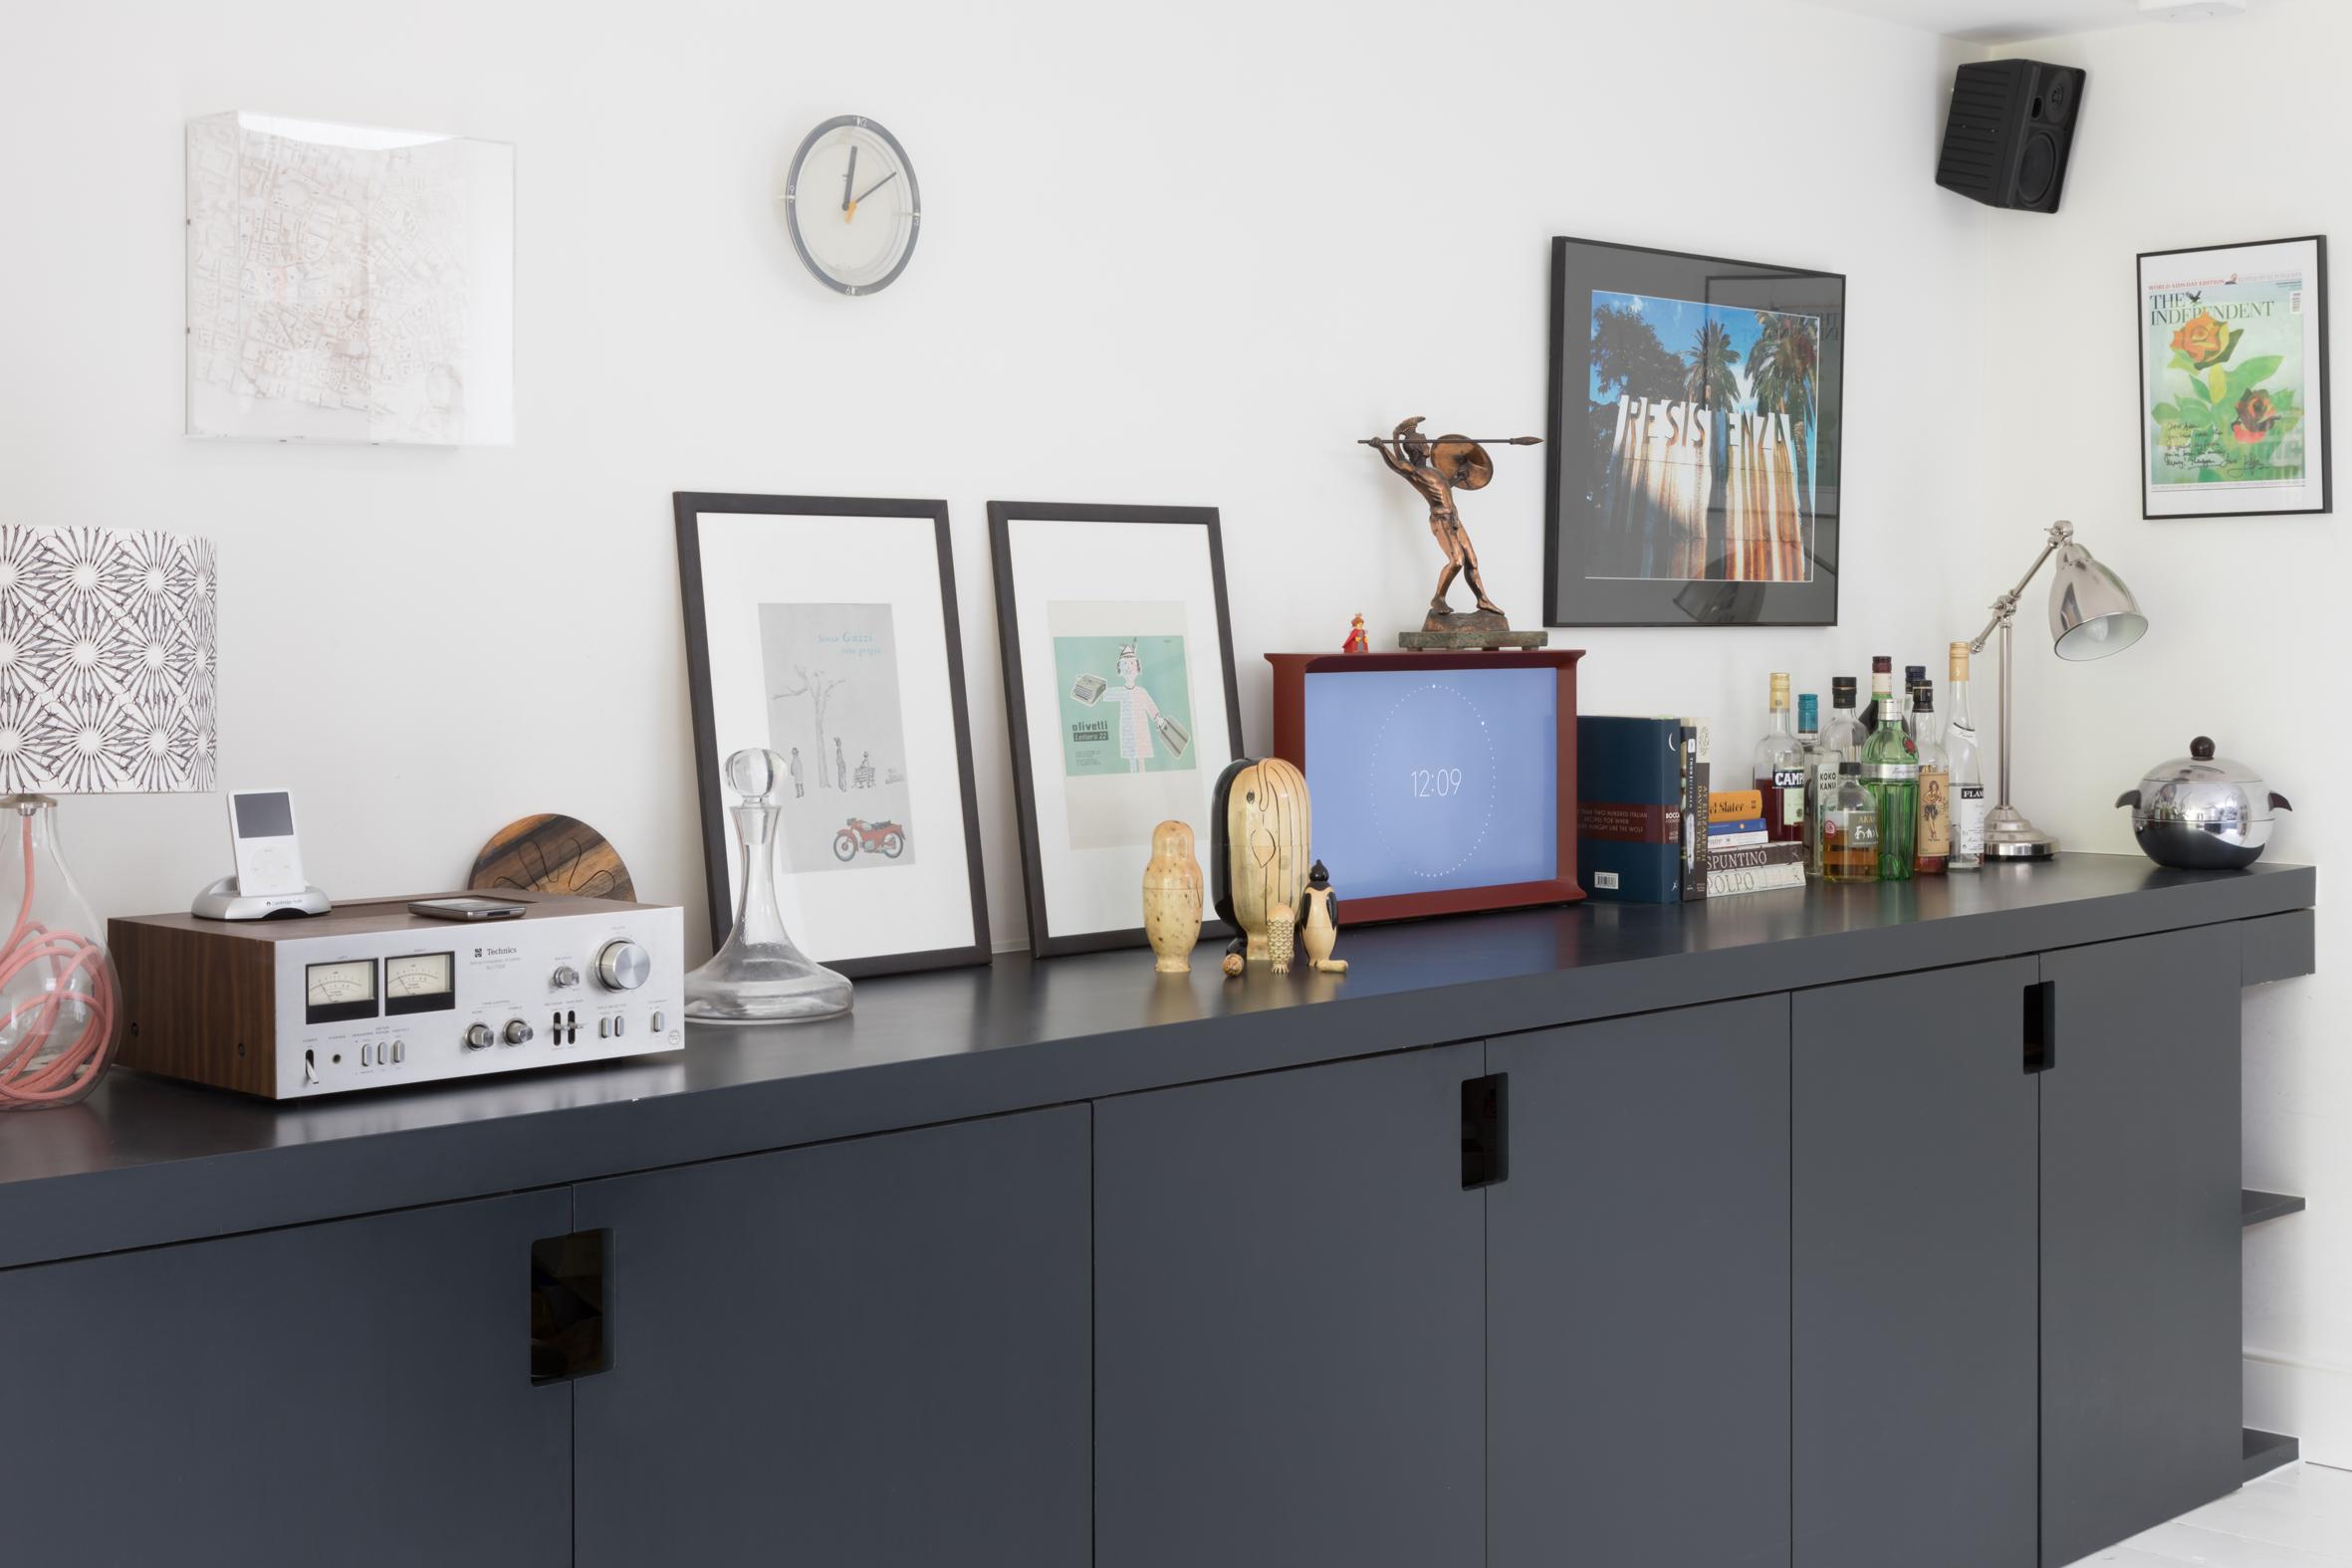 How To Plan A Kitchen By Kate Watson Smyth - Der Kern by Miele